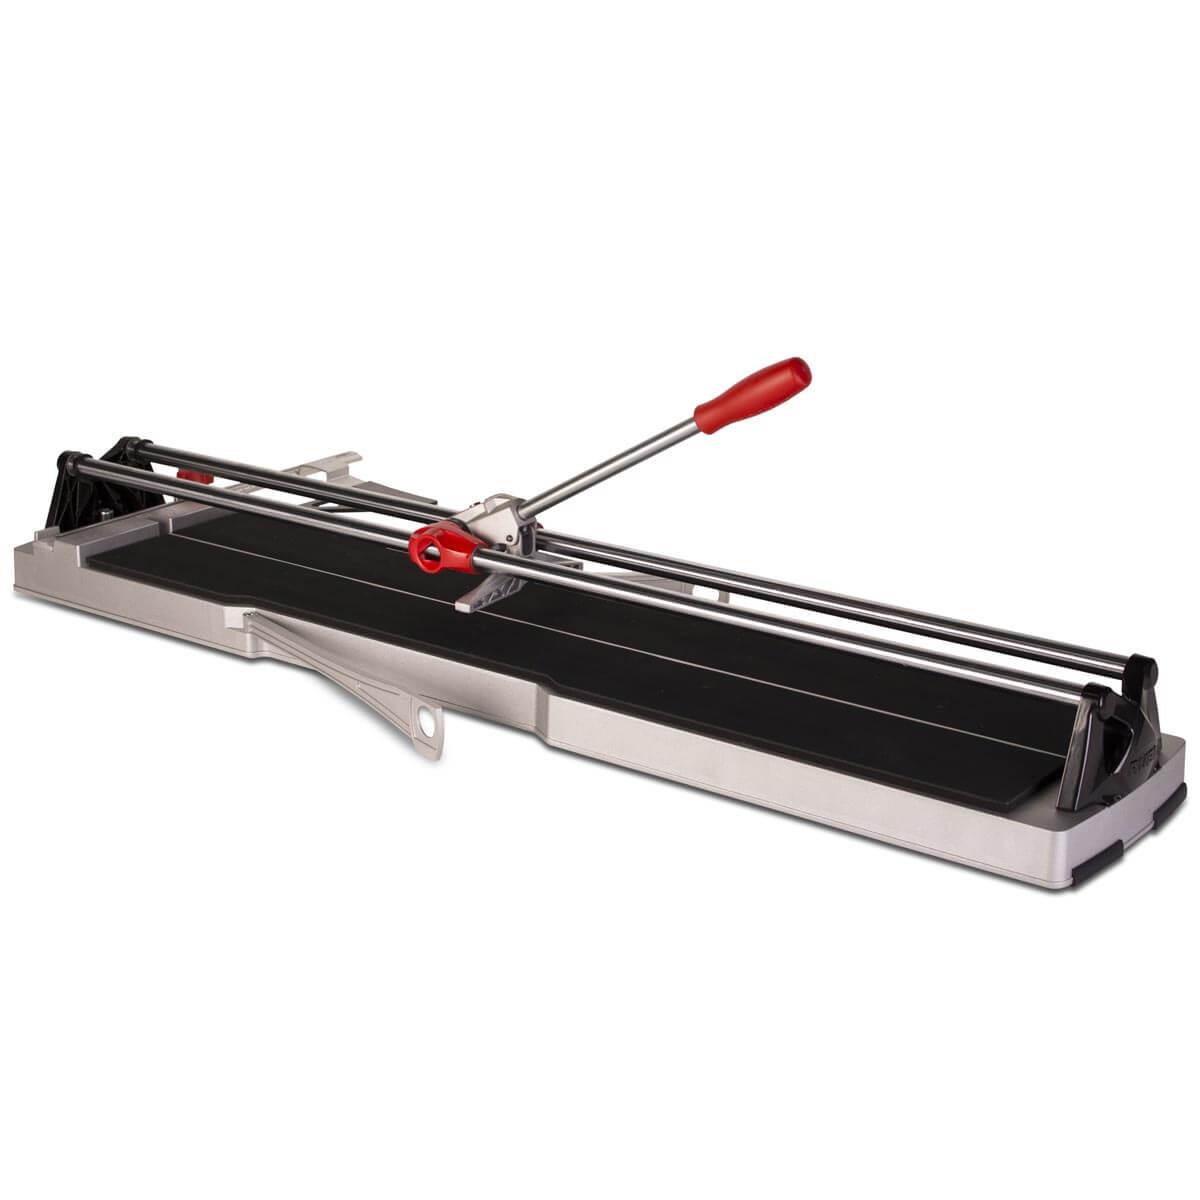 Rubi Speed-N Tile Cutters 28 inch